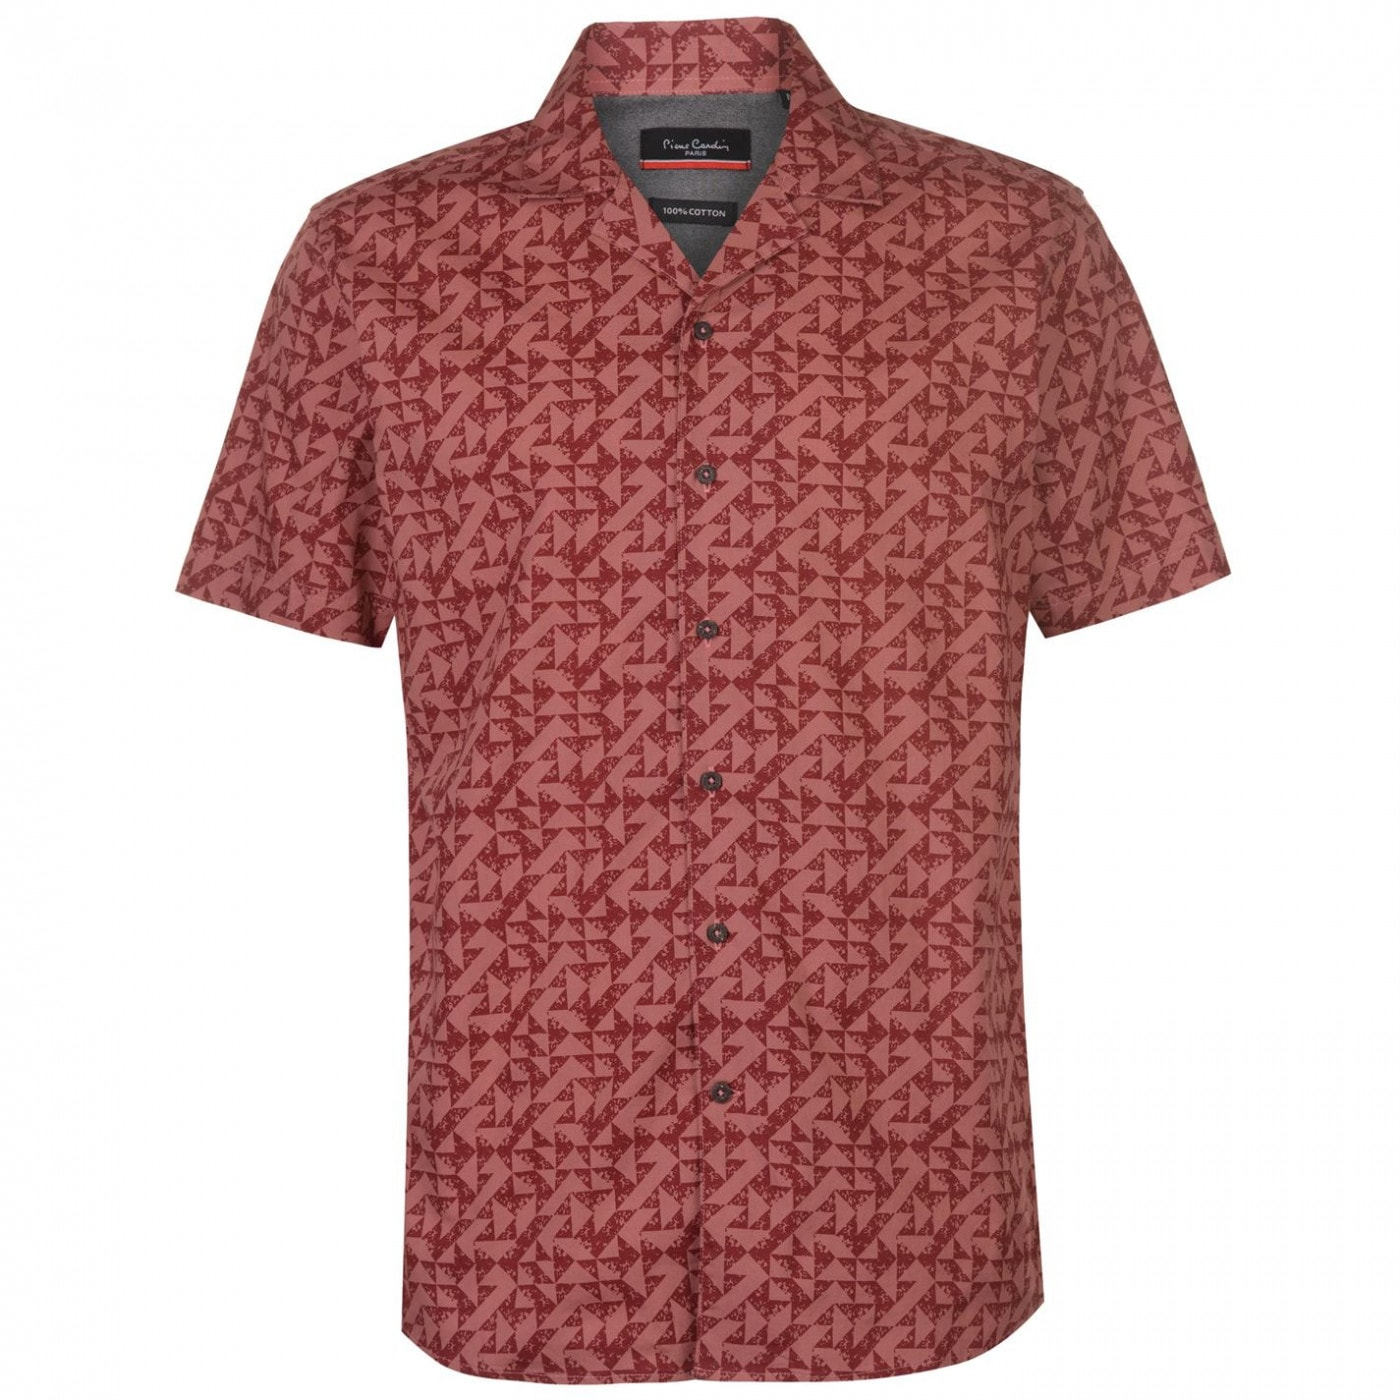 Men's shirt Pierre Cardin Reverse Geometric Print